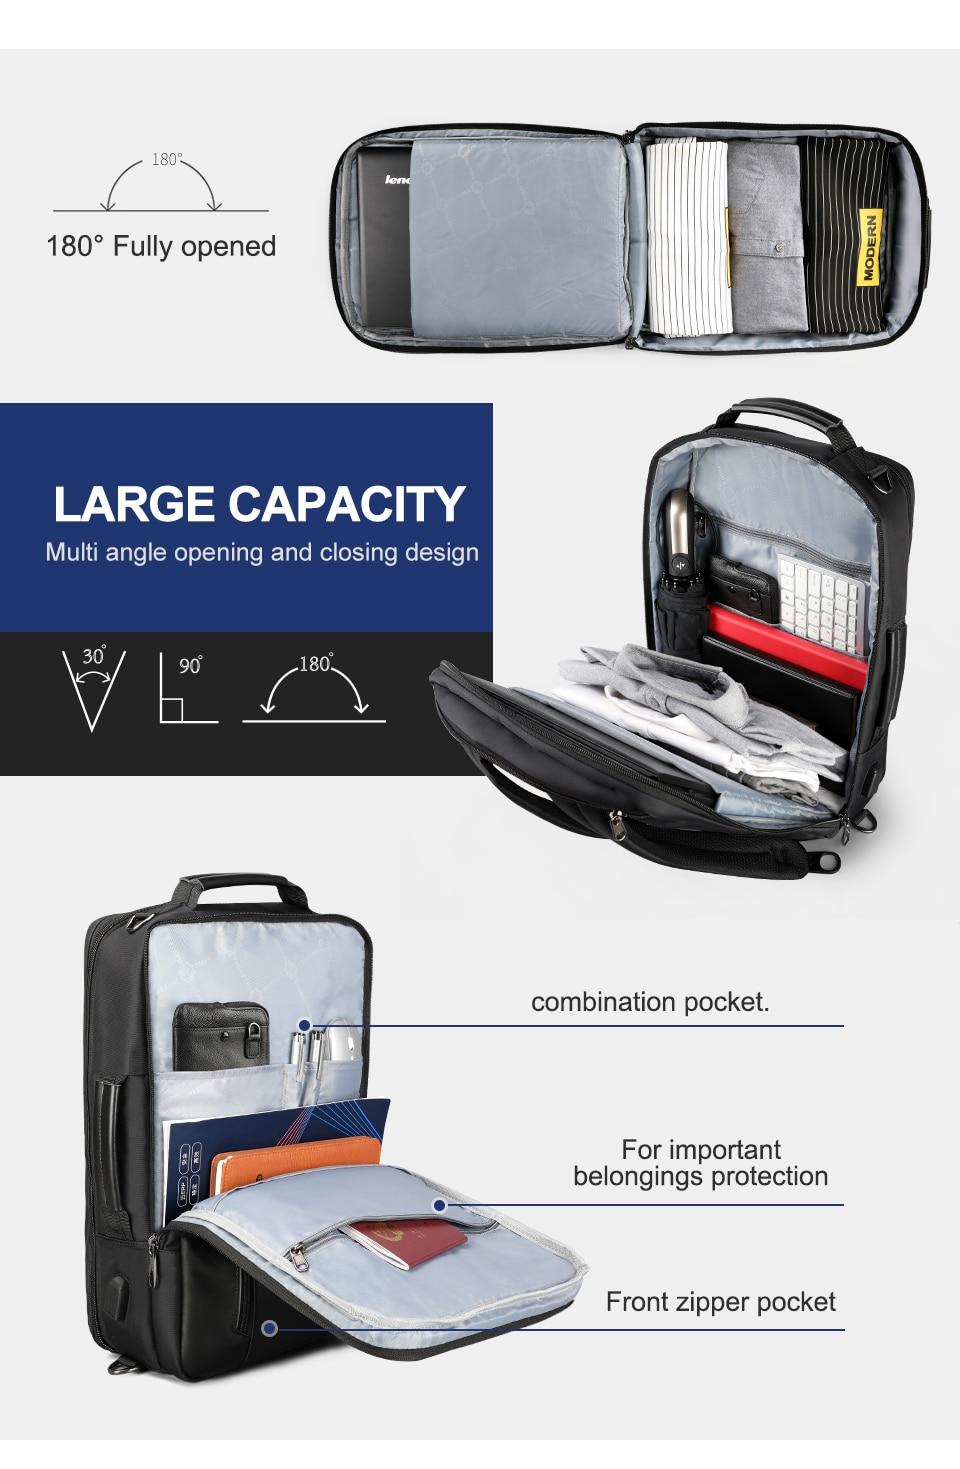 7.large capacity